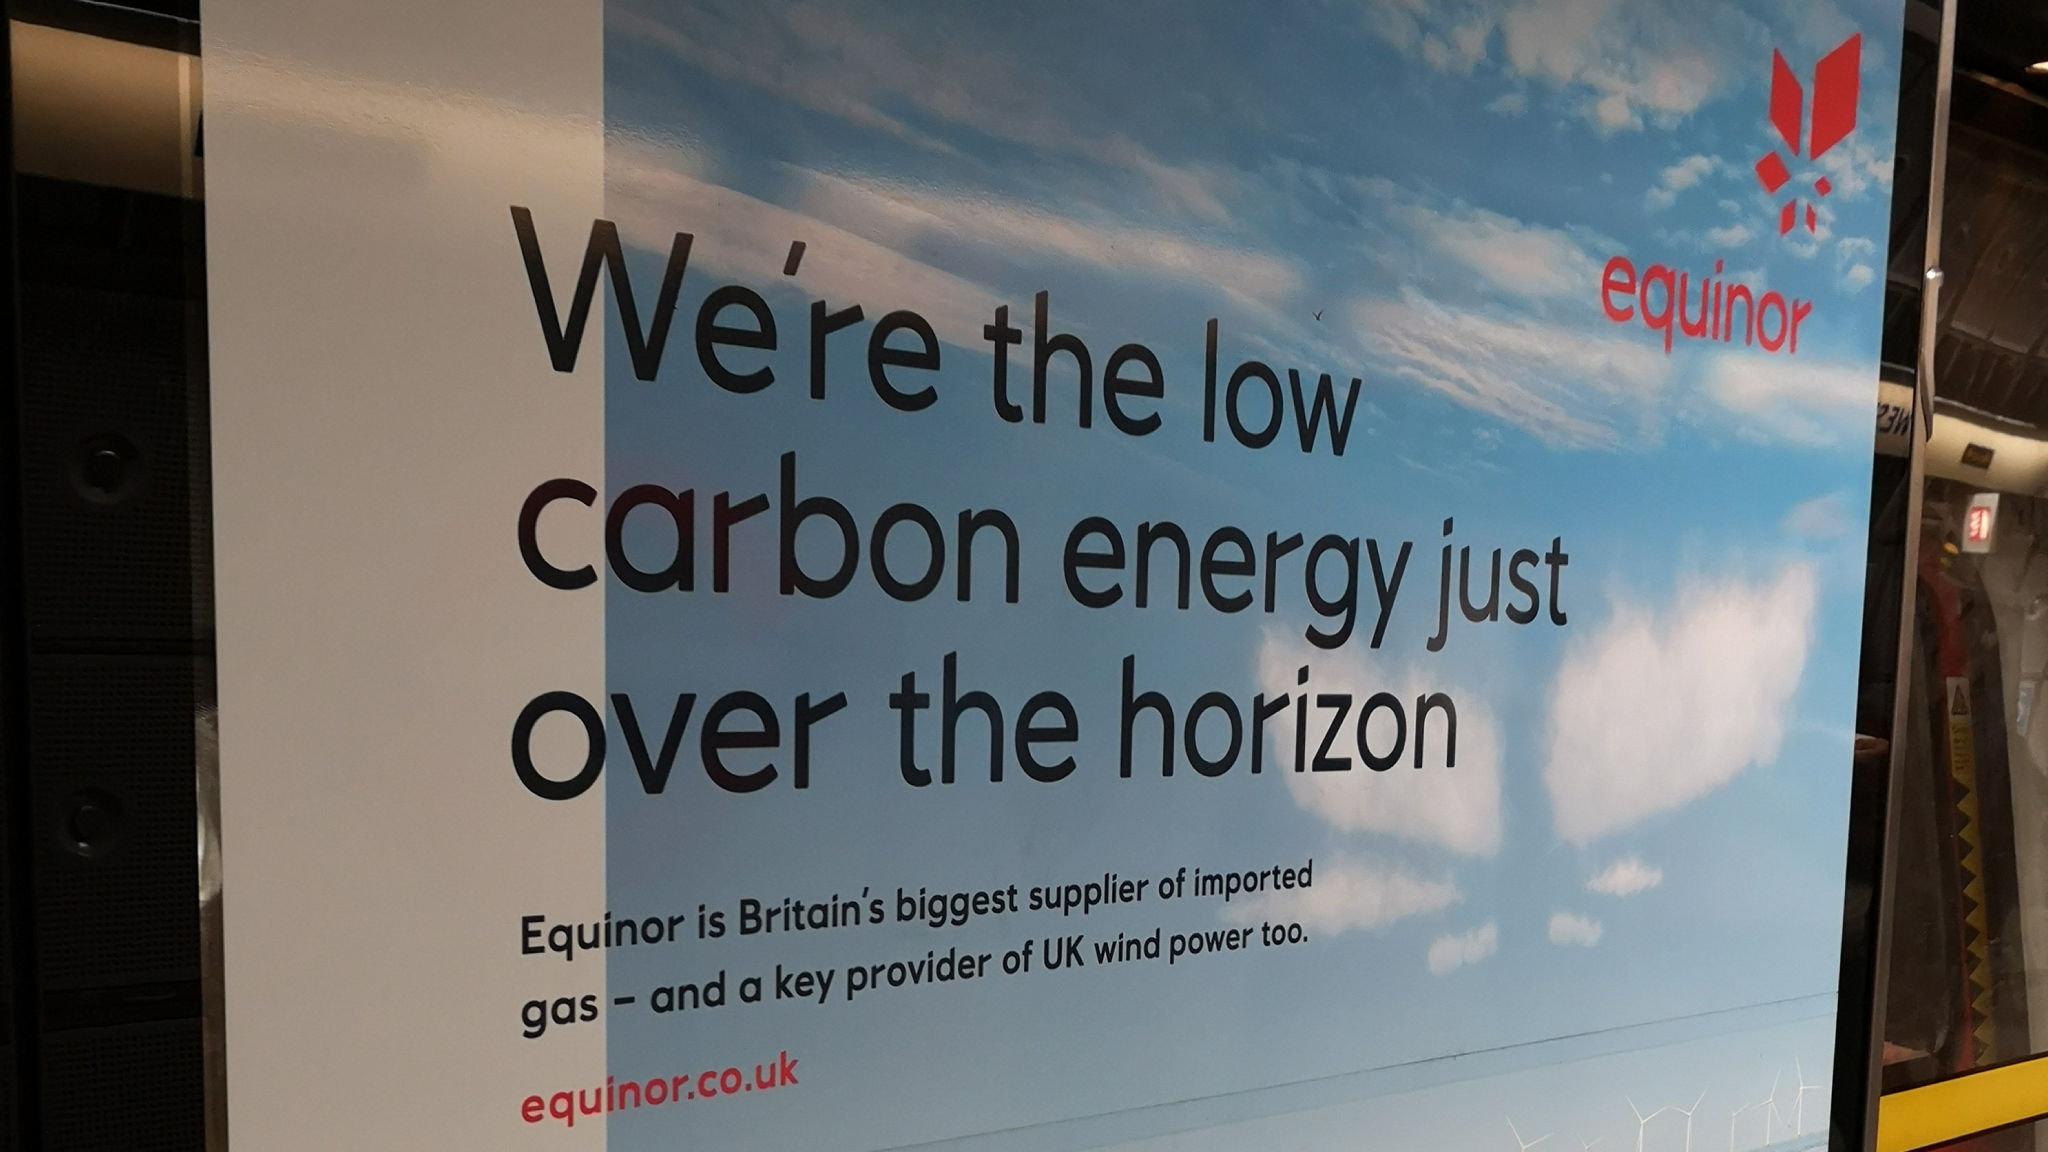 UK watchdog warns energy group Equinor over advertisement